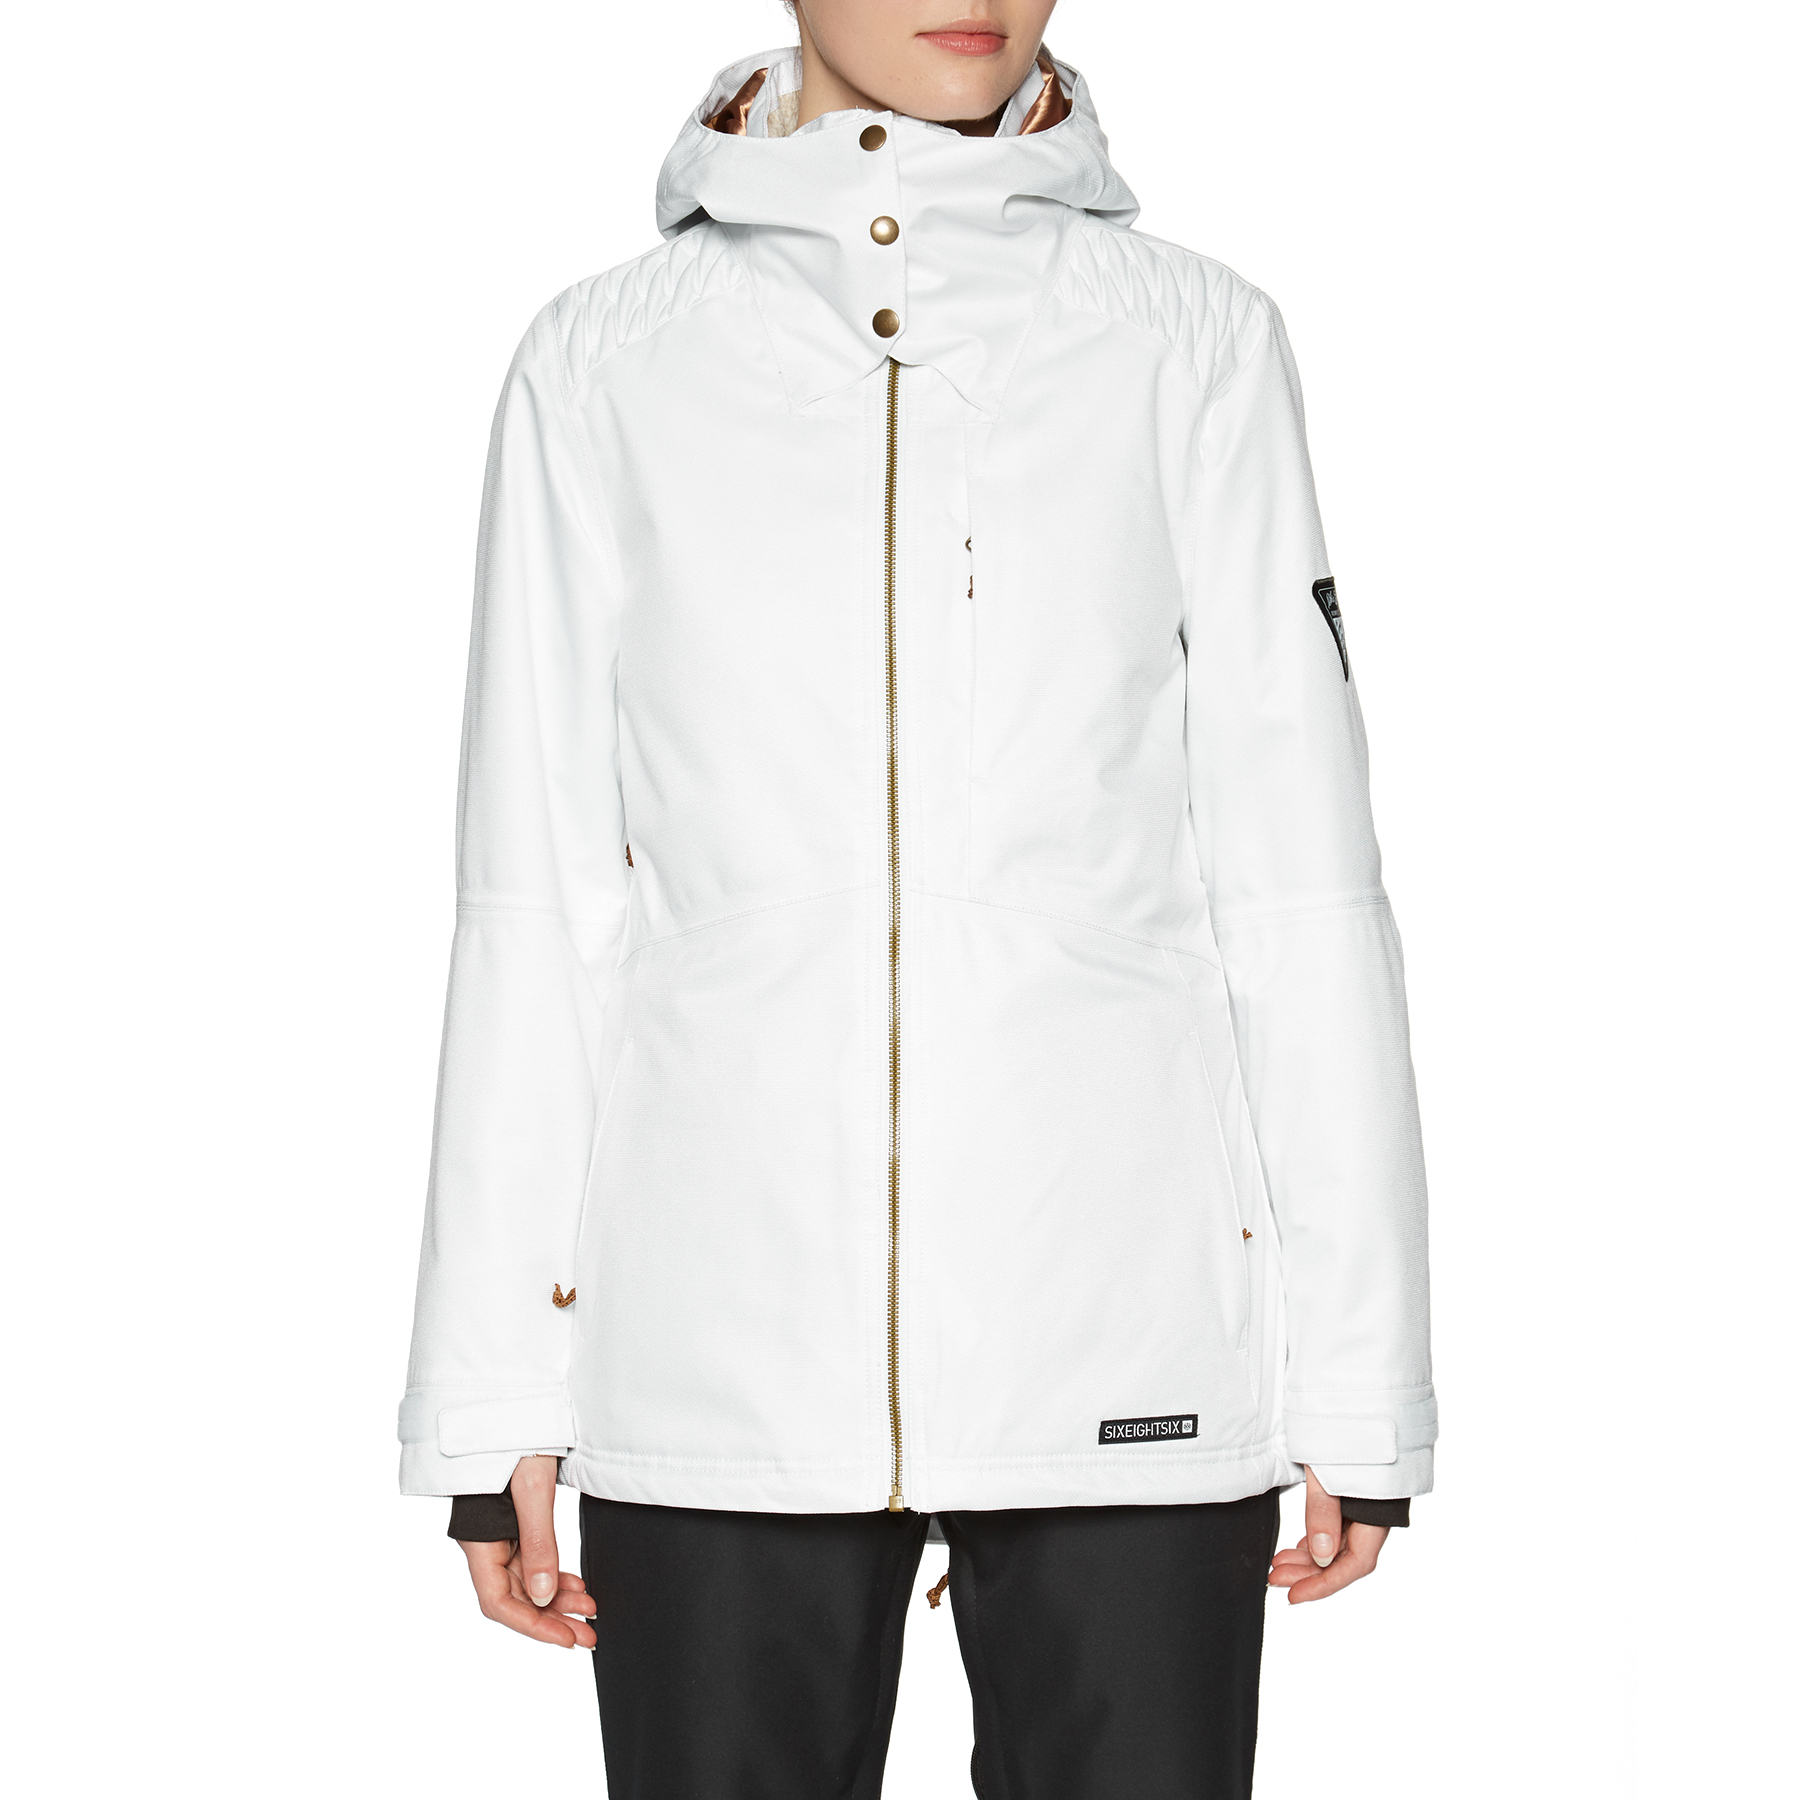 Armada Helena Insulated Womens Jacket